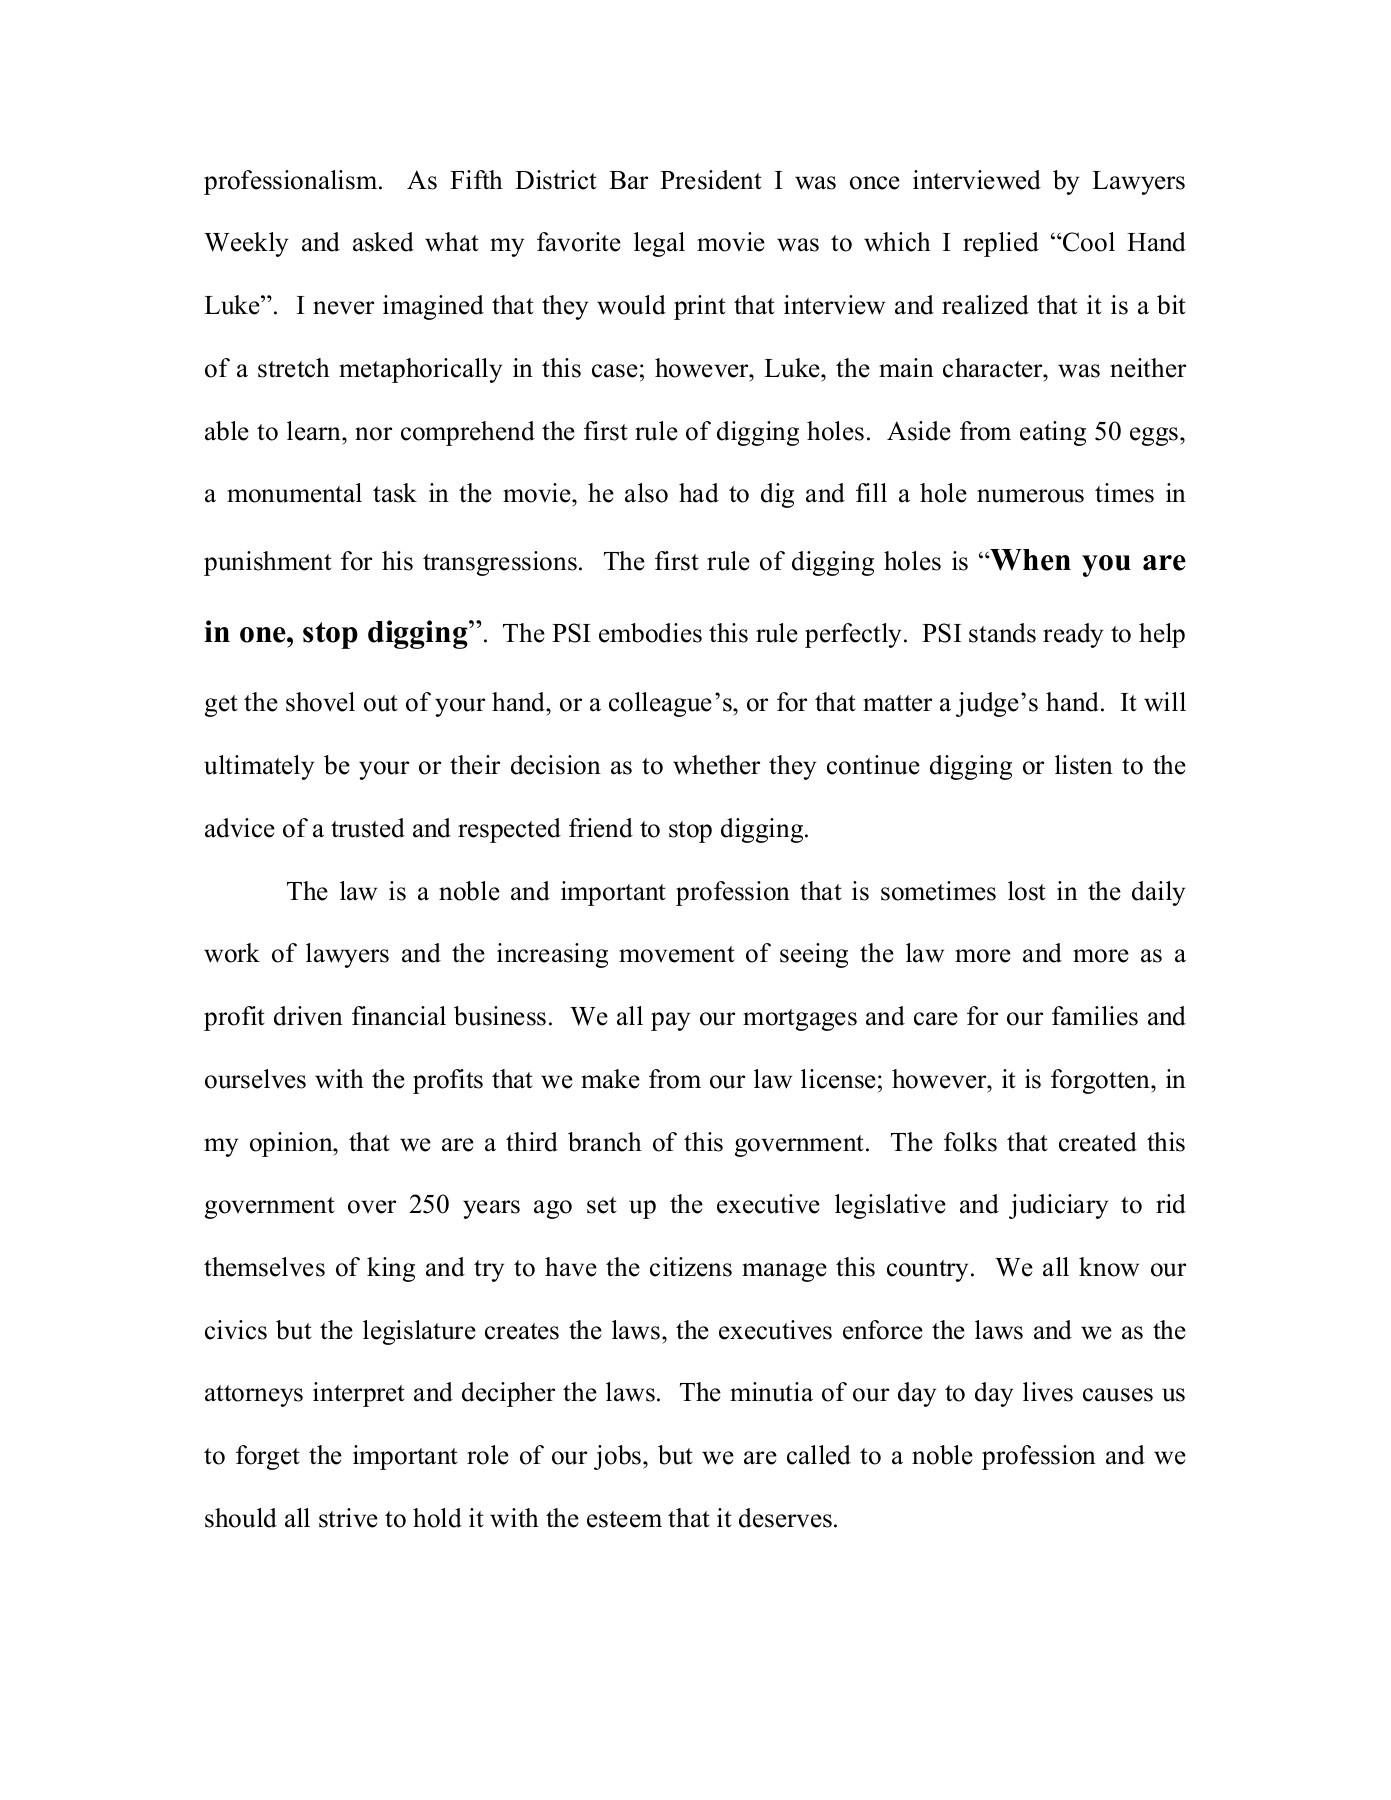 020 Professionalism Essay Sensational Pdf Conclusion Teacher Full